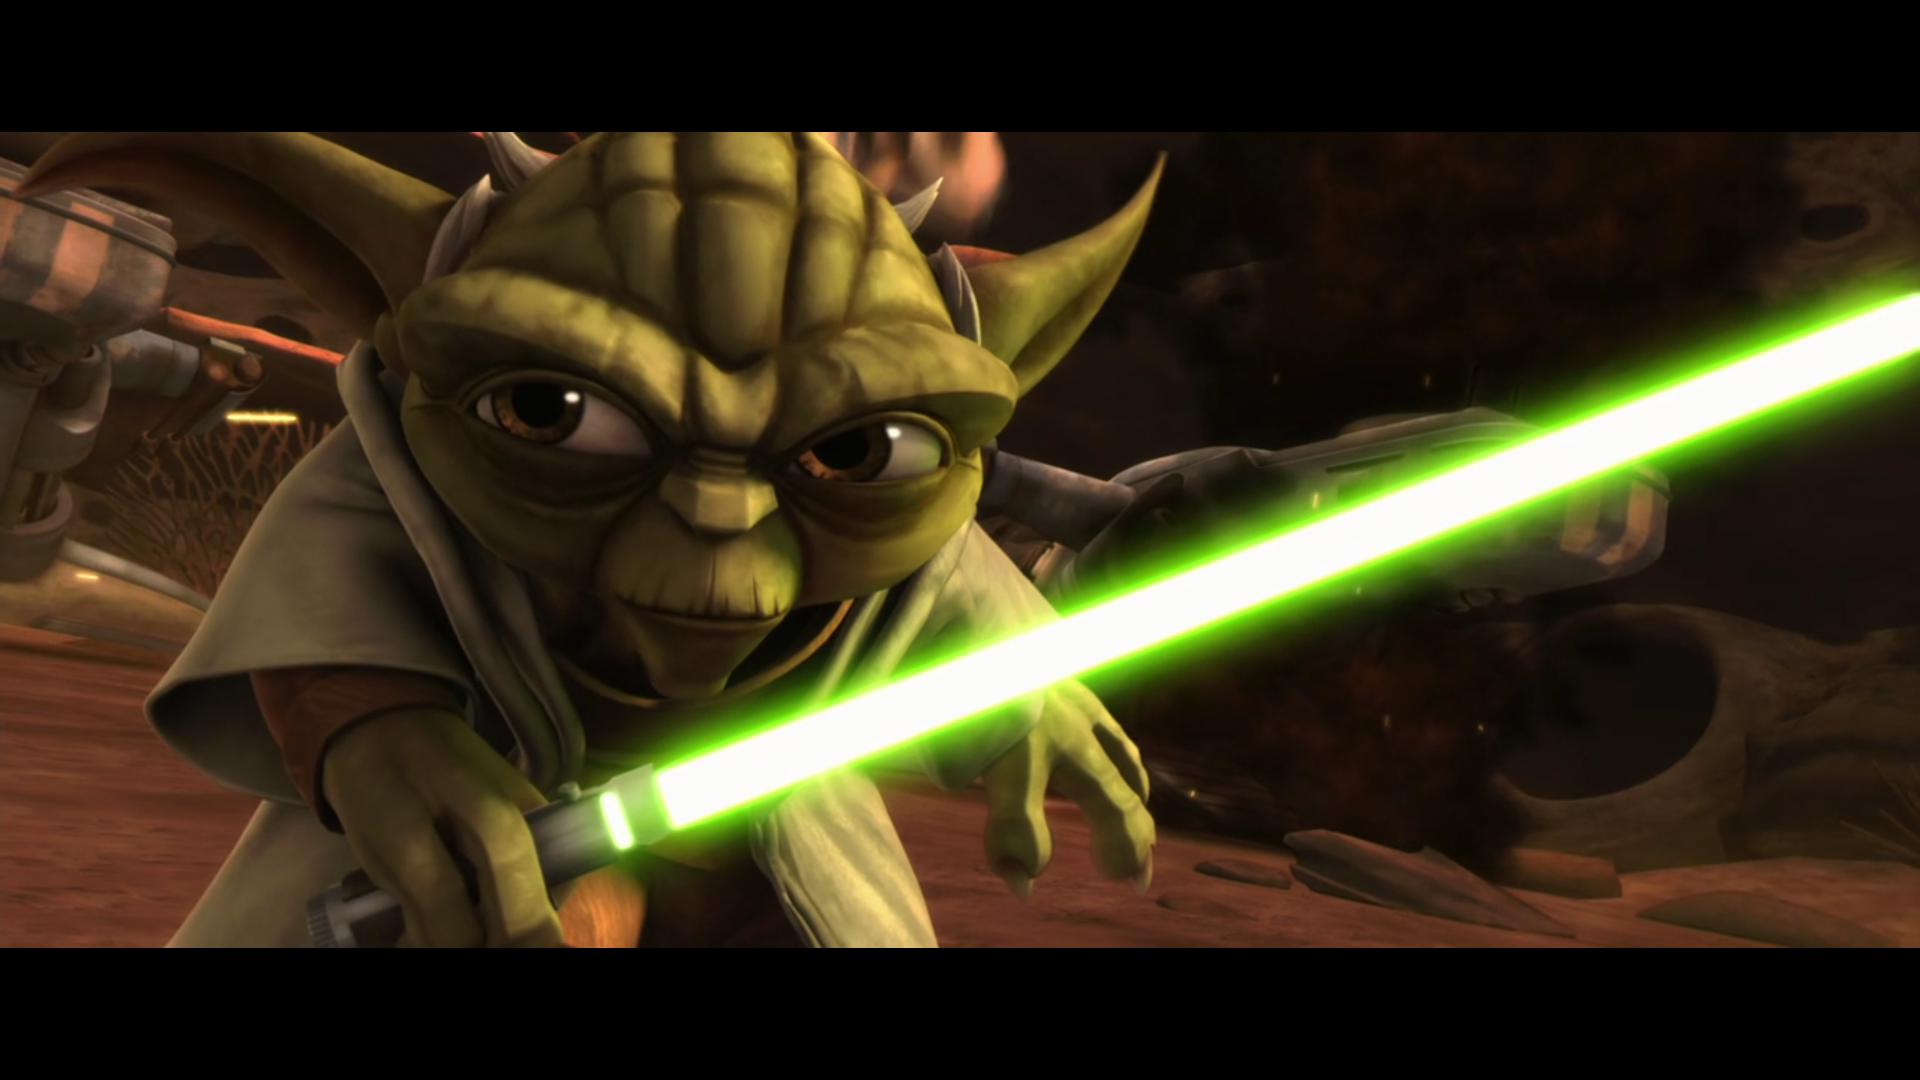 Star Wars: The Clone Wars — s01e01 — Ambush